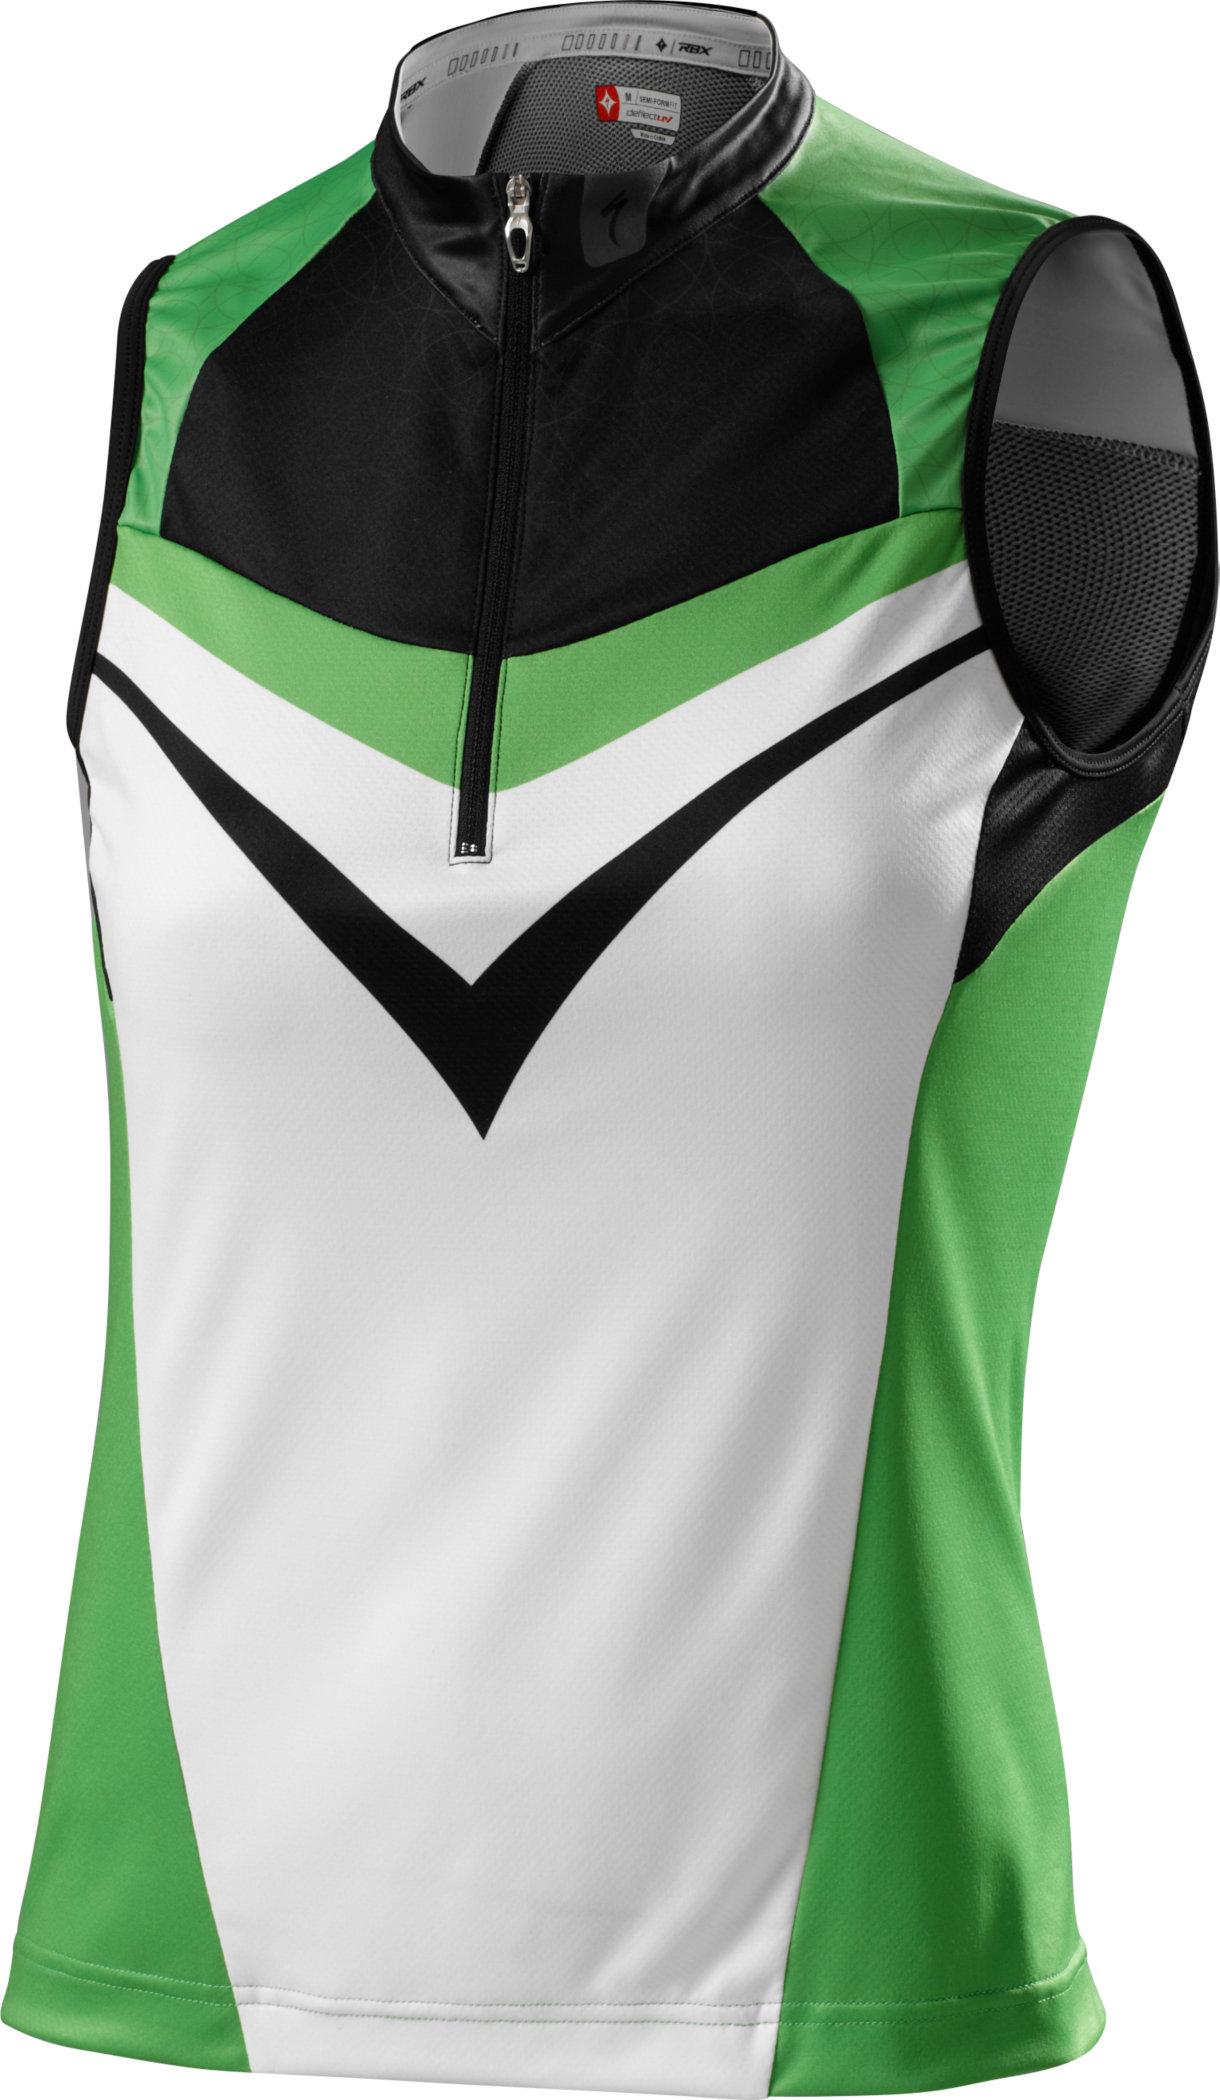 Specialized RBX Comp Trikot ohne Arm Black/Moto Green Medium - Alpha Bikes